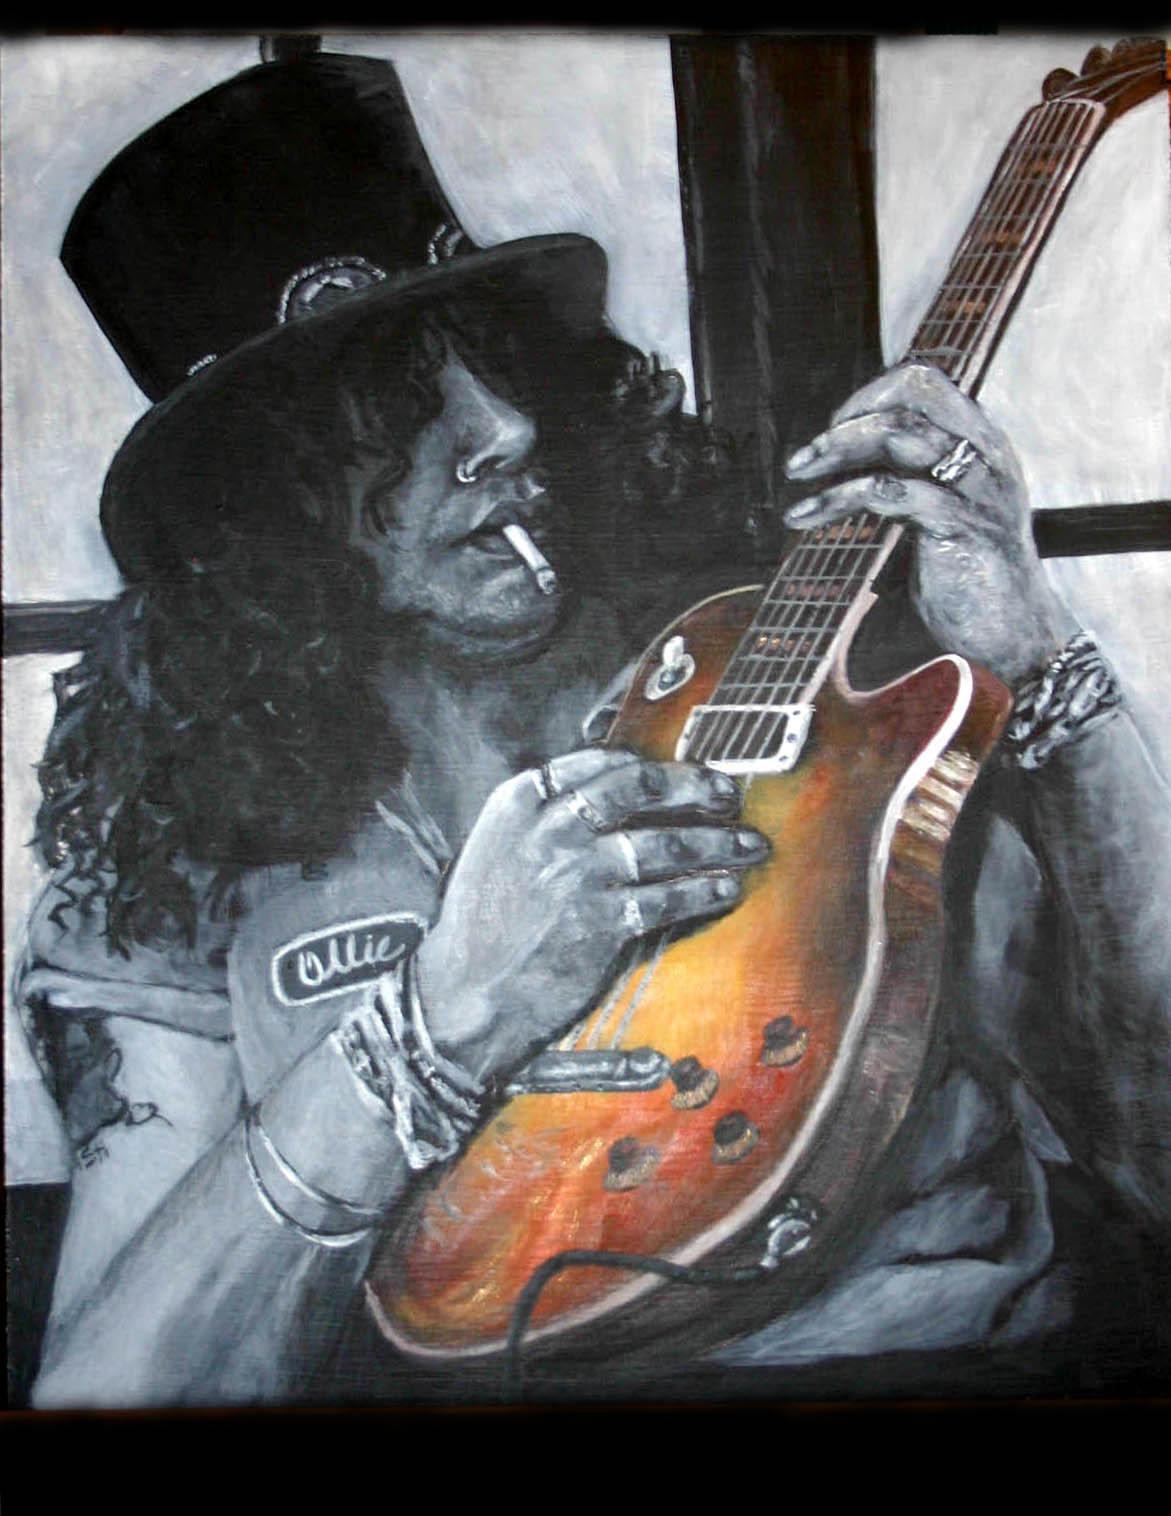 el mejor guitarrista